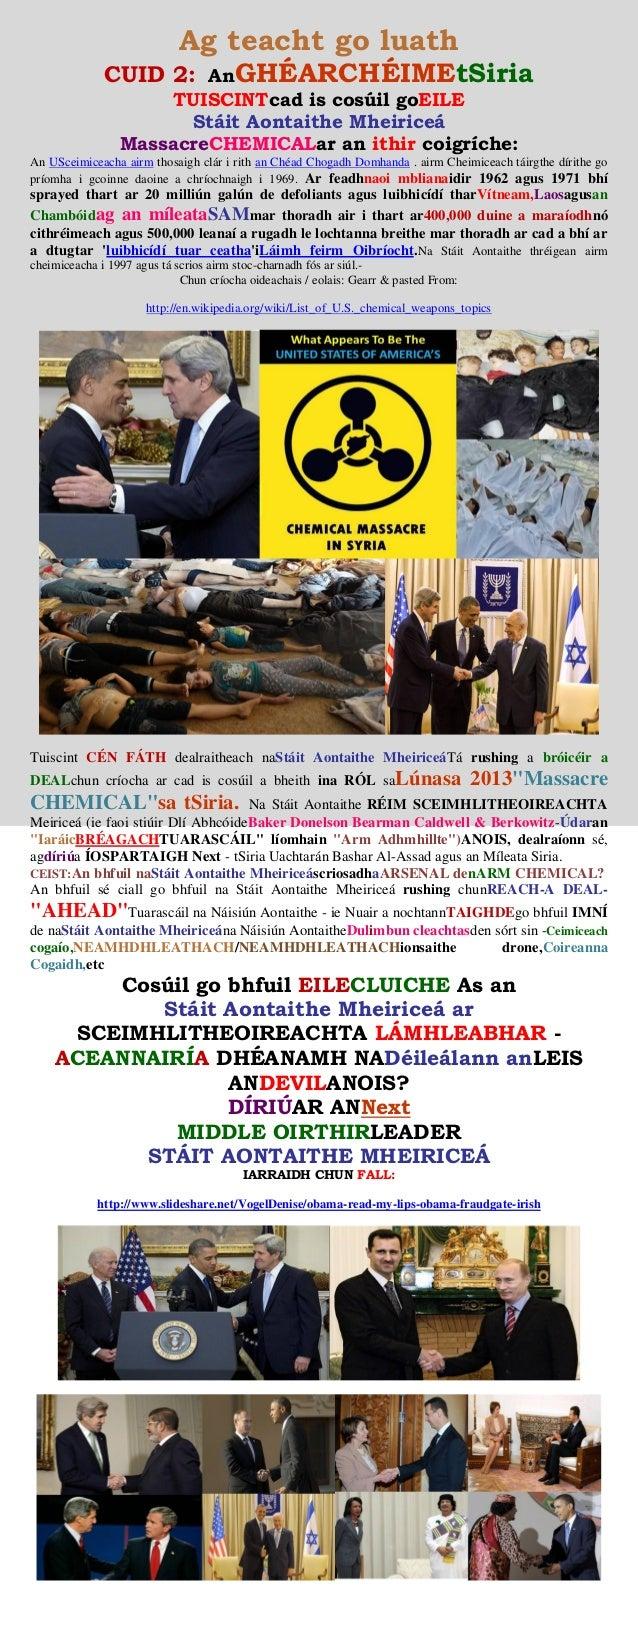 SYRIA CRISIS - (USA) CHEMICAL WEAPONS ATTACK (irish)